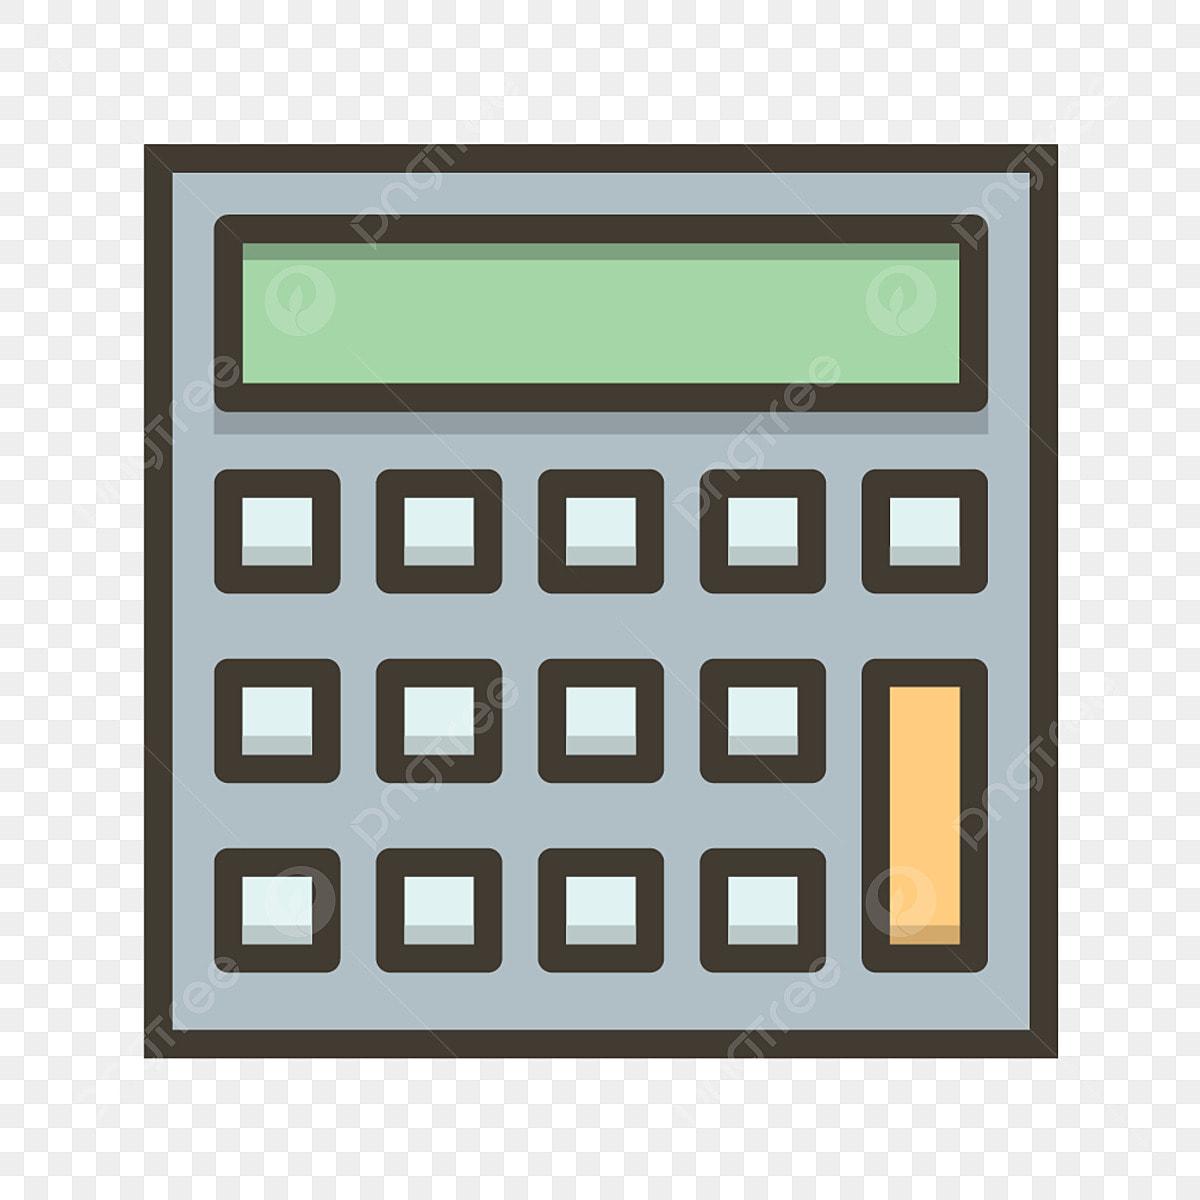 Vector Calculator Icon, Calculator Icon, Calculation Icon